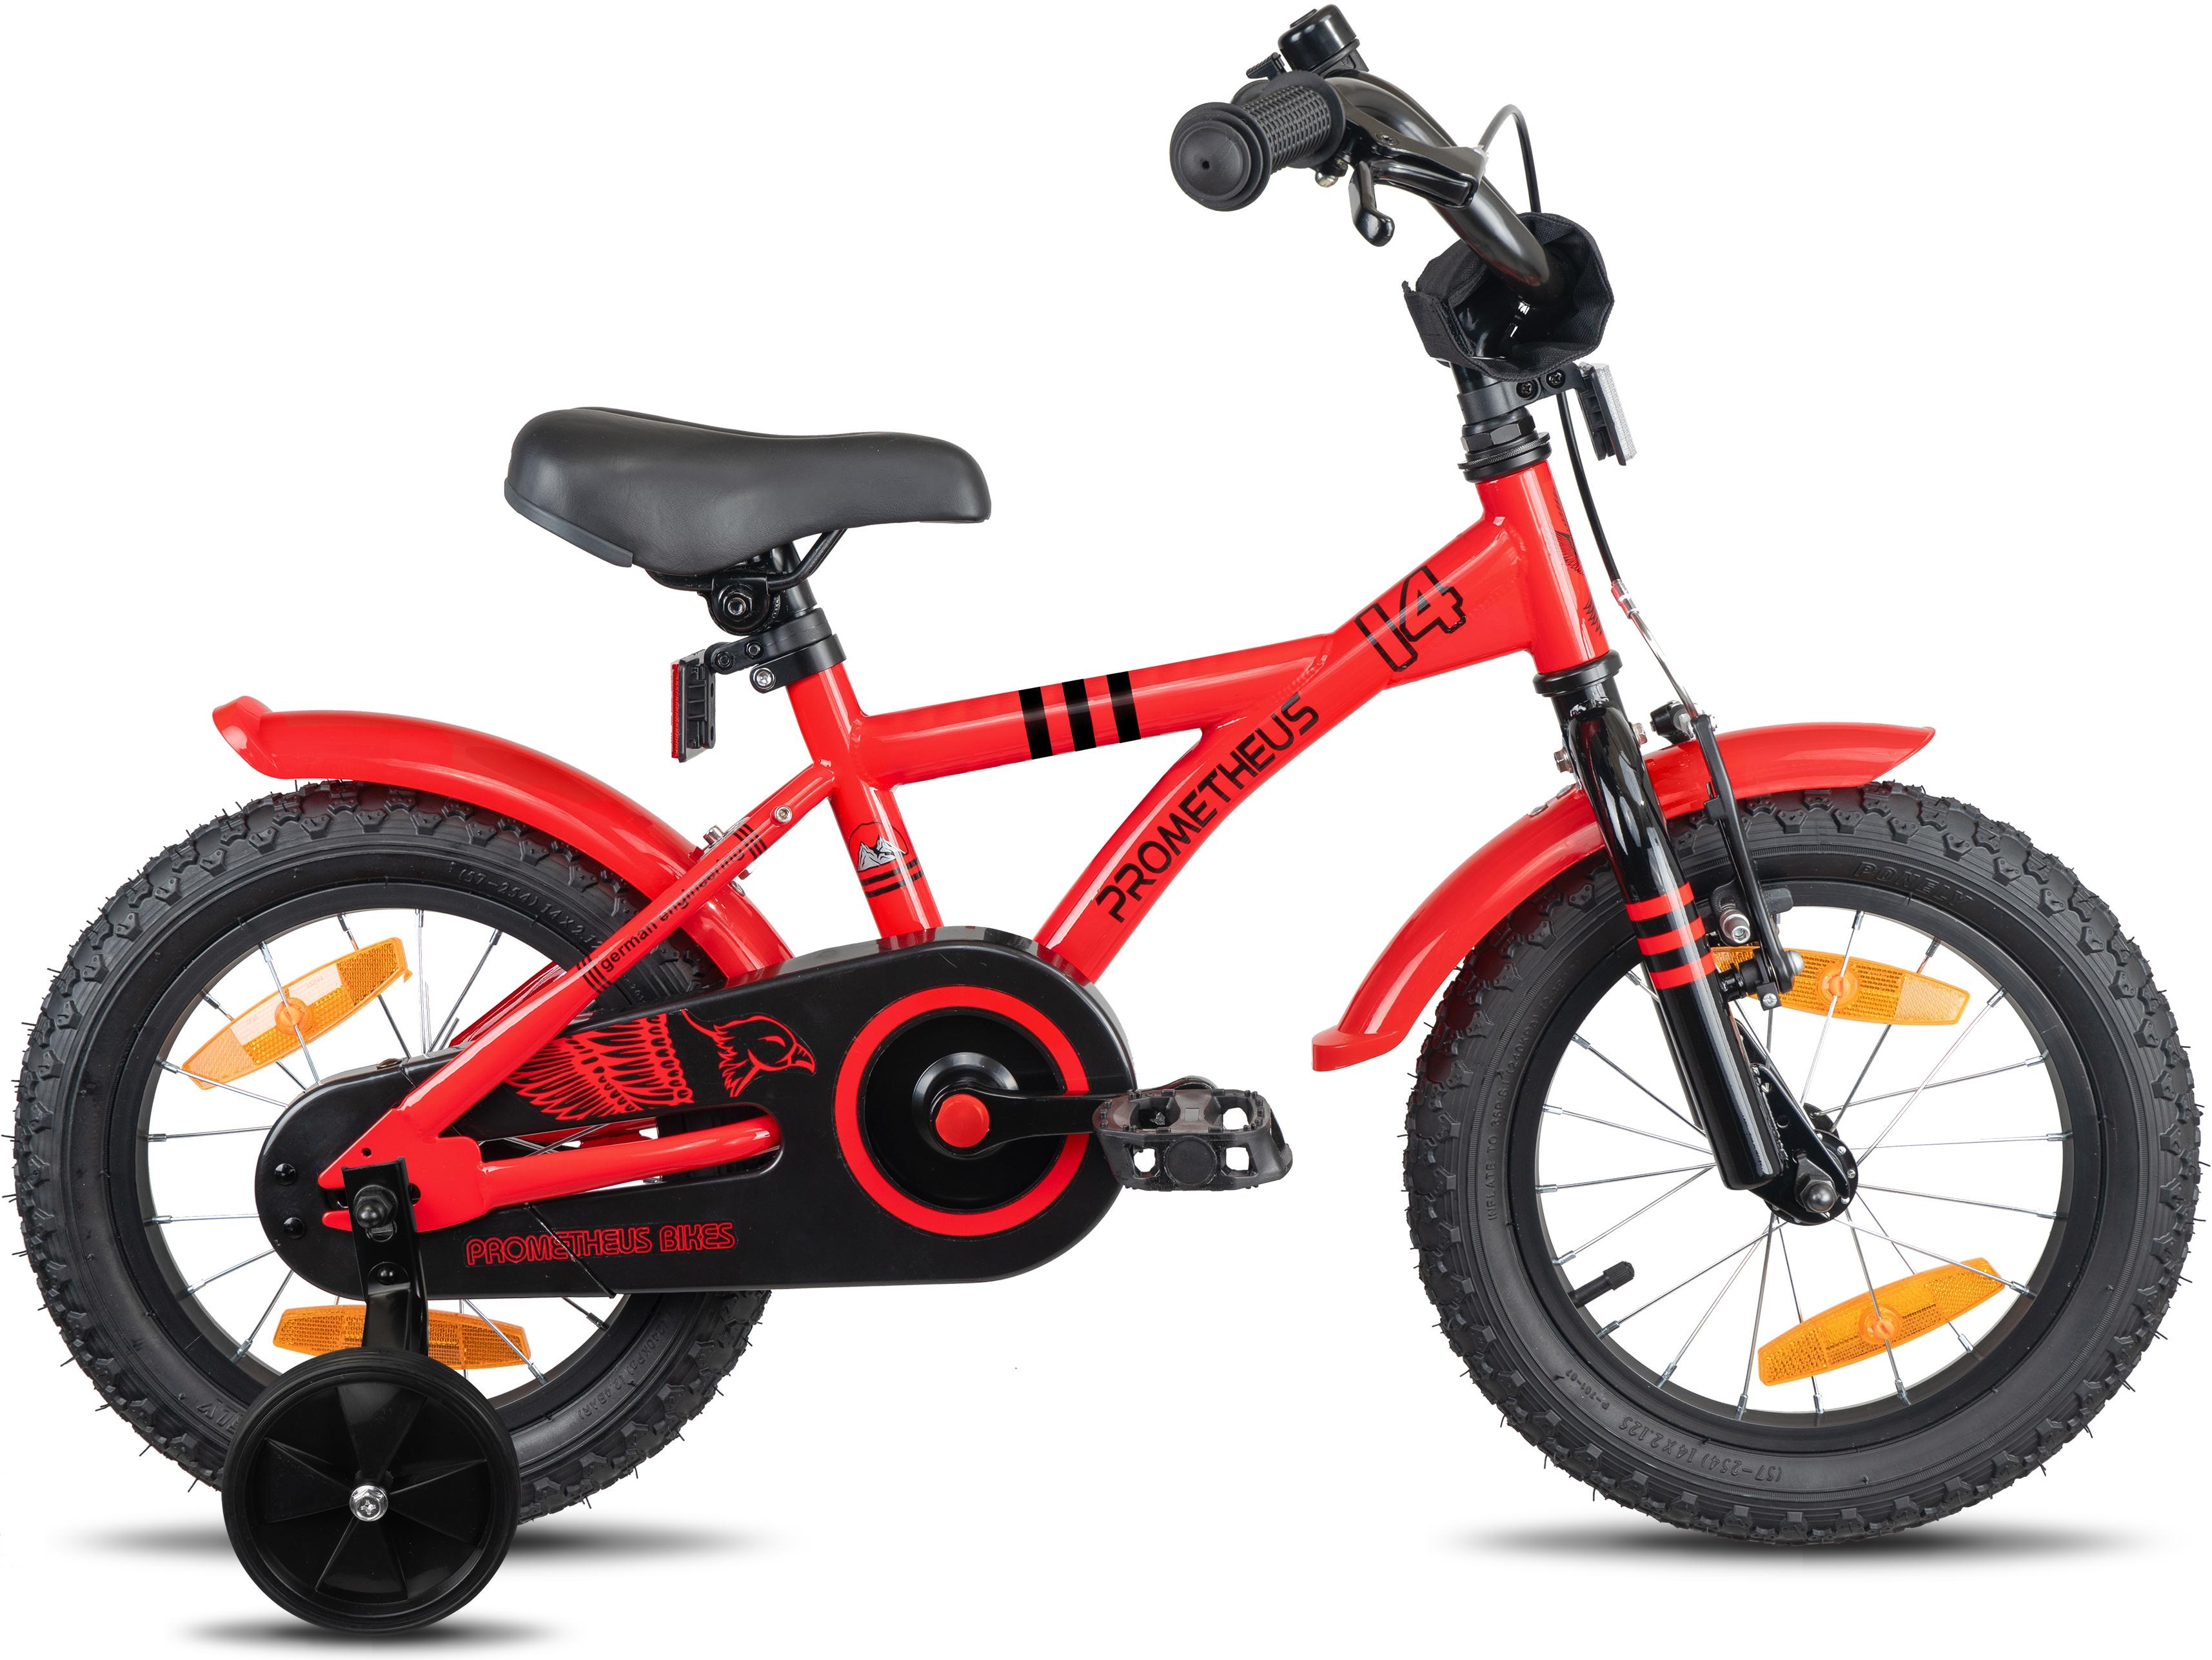 PROMETHEUS BICYCLES Kinderfahrrad Hawk, 1 Gang rot Kinder Kinderfahrräder Fahrräder Zubehör Fahrrad